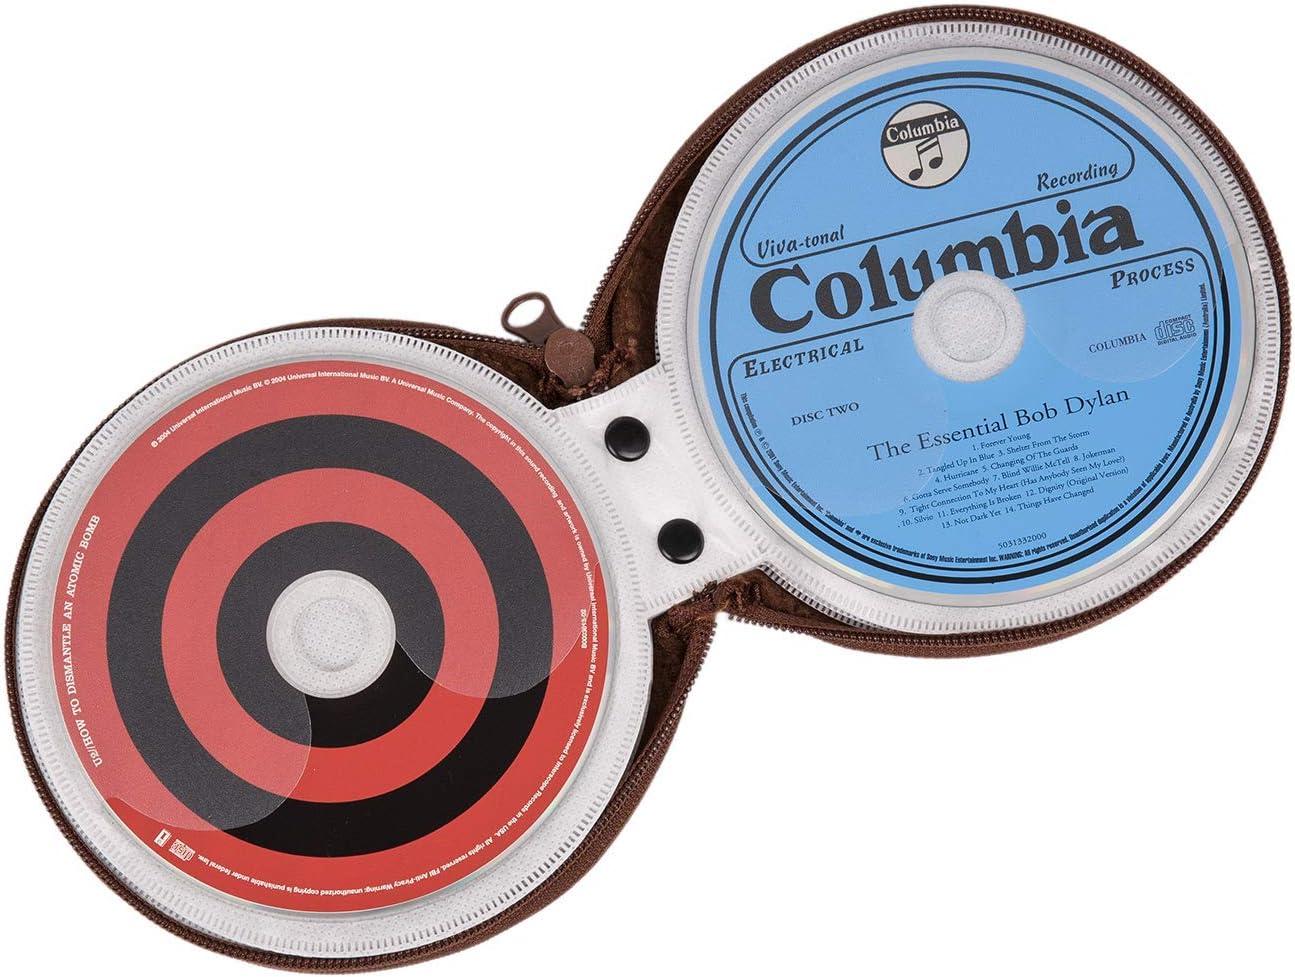 Elezay CD Case DVD Wallet Disc CD-ROM Racks Home Audio Accessories Media Storage Round Felt 20 Capacity Brown Brown